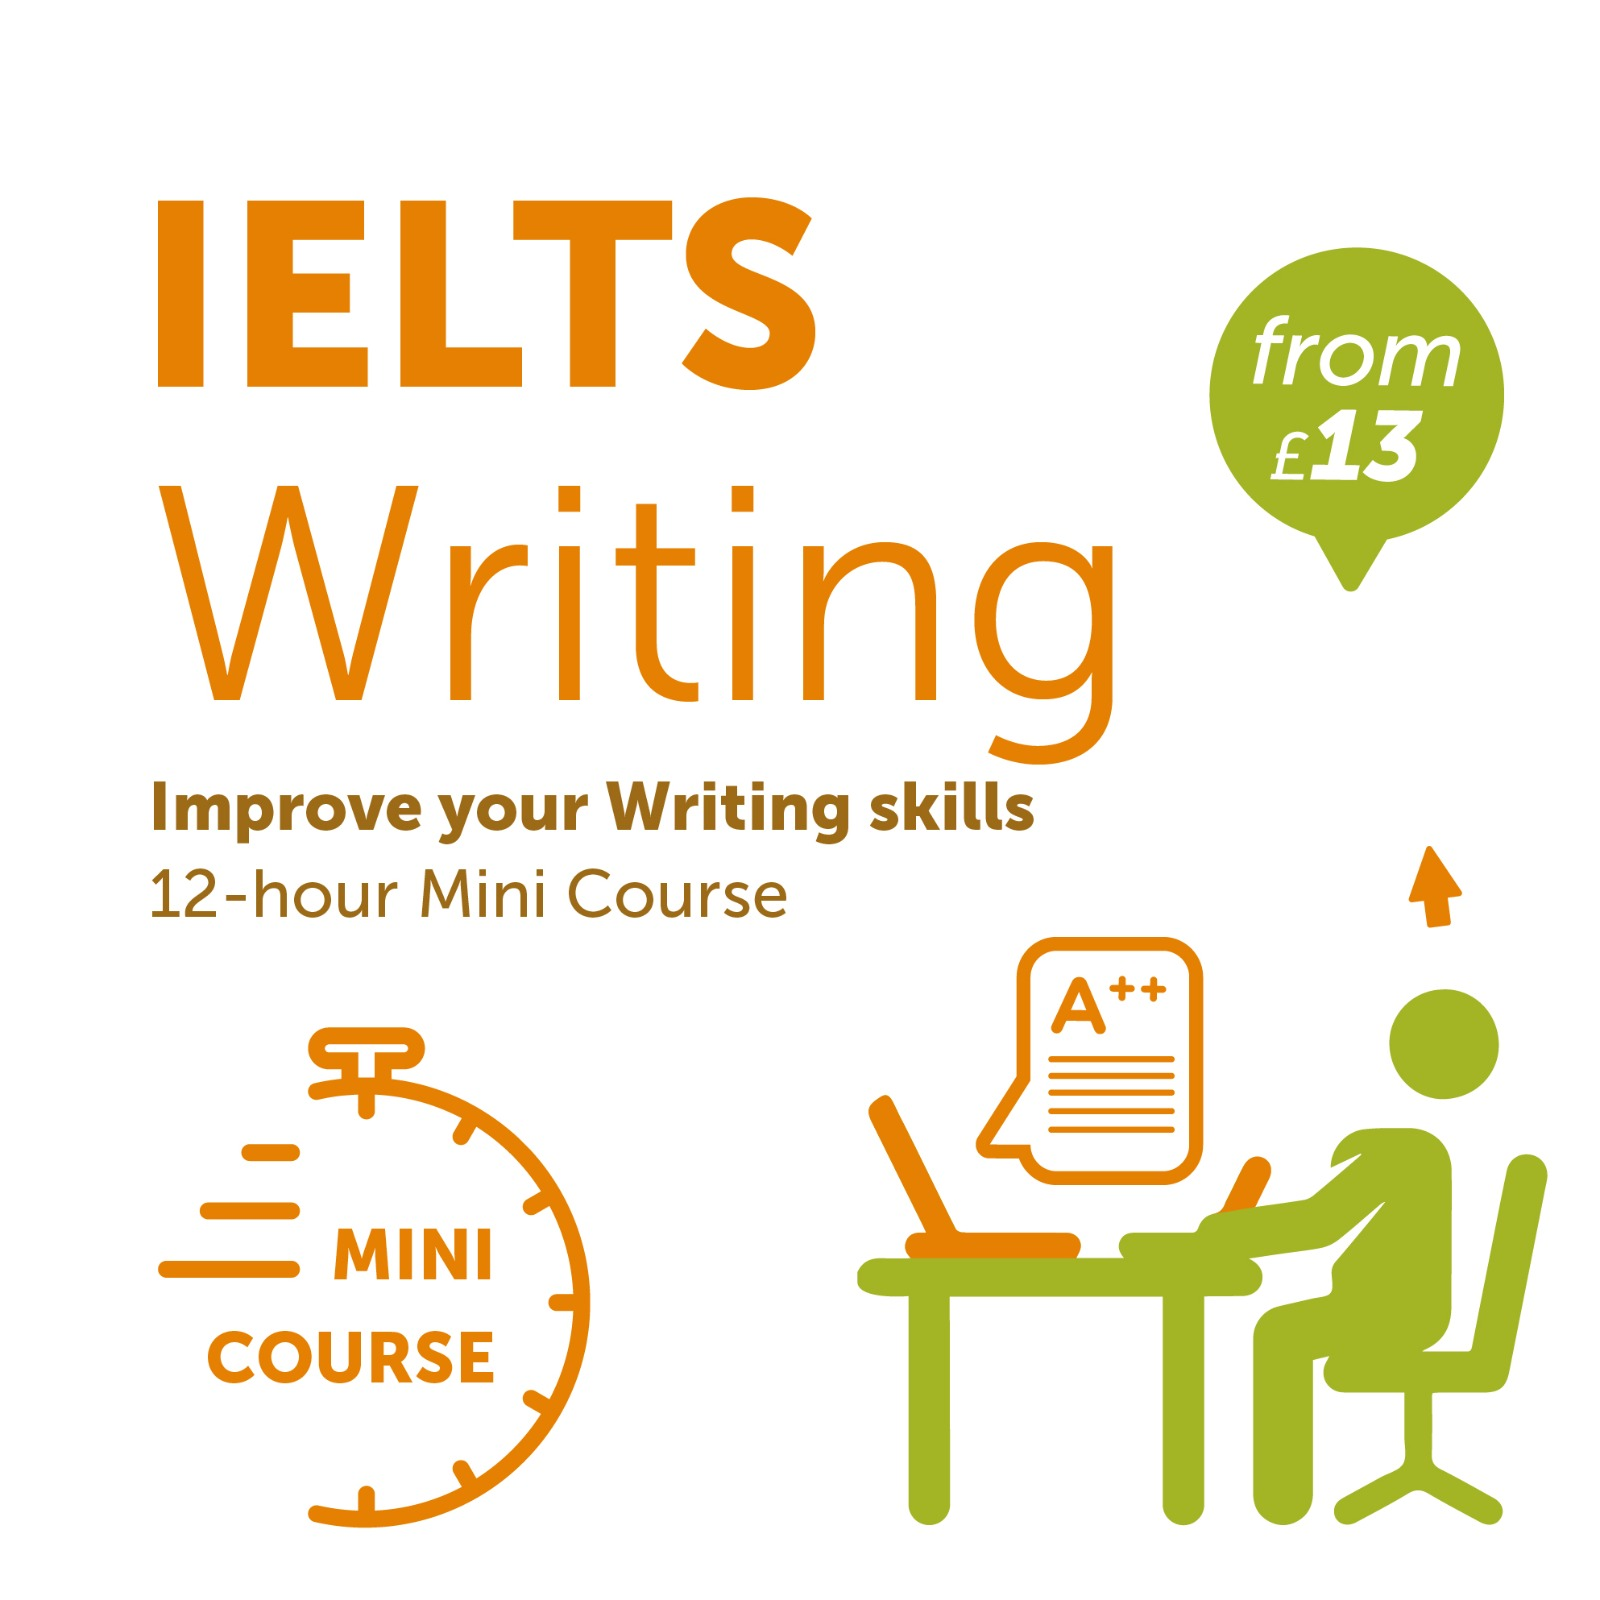 IELTS Writing Mini Course